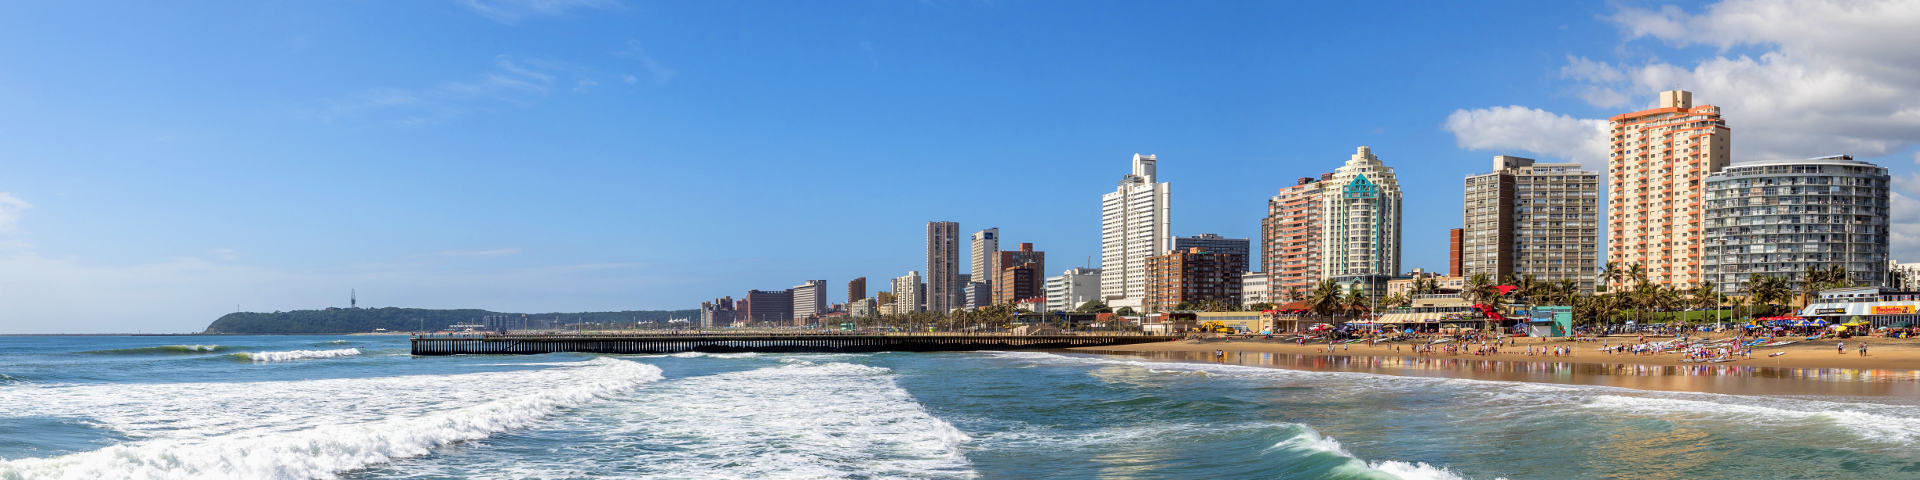 Durban africa hero